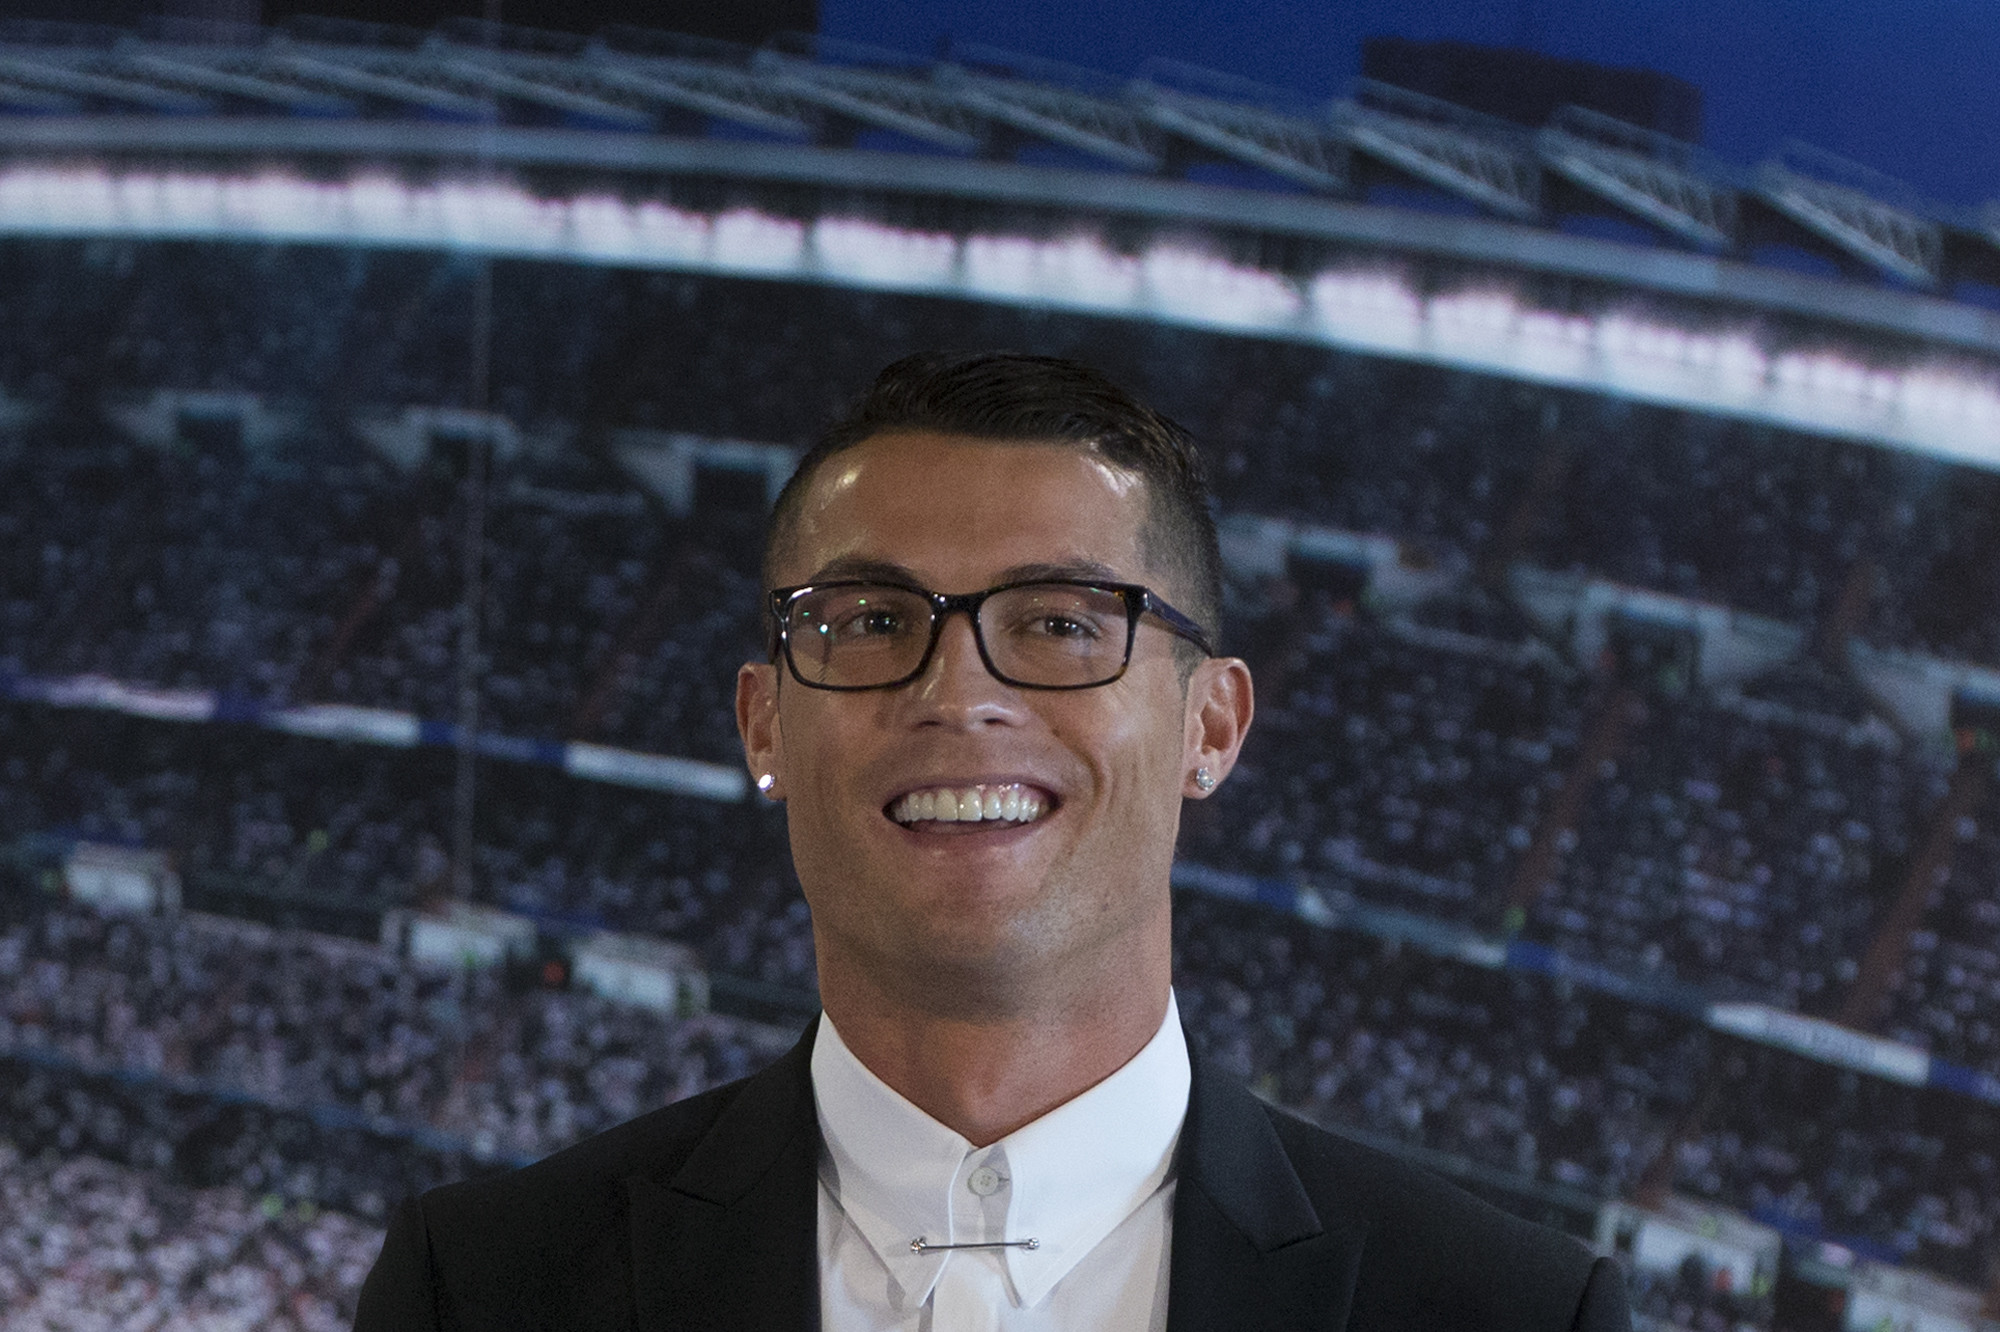 Роналду желает  уйти вМЮ за89 млн фунтов— Daily Record